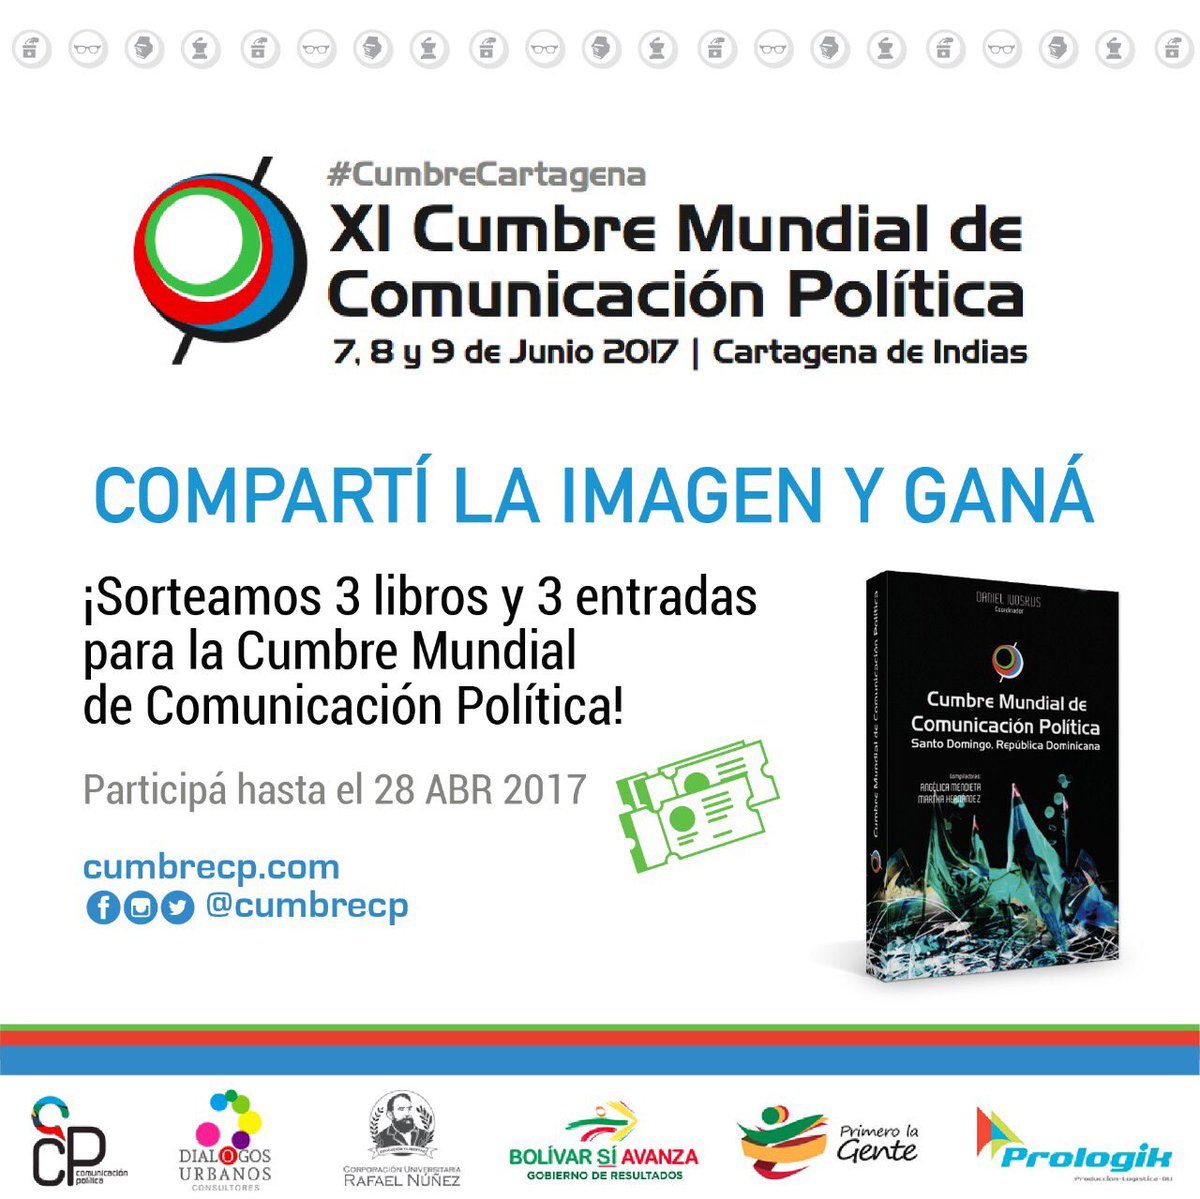 Compartí La Imagen y Gana!! @CumbreCP https://t.co/zaohbd7ZVN